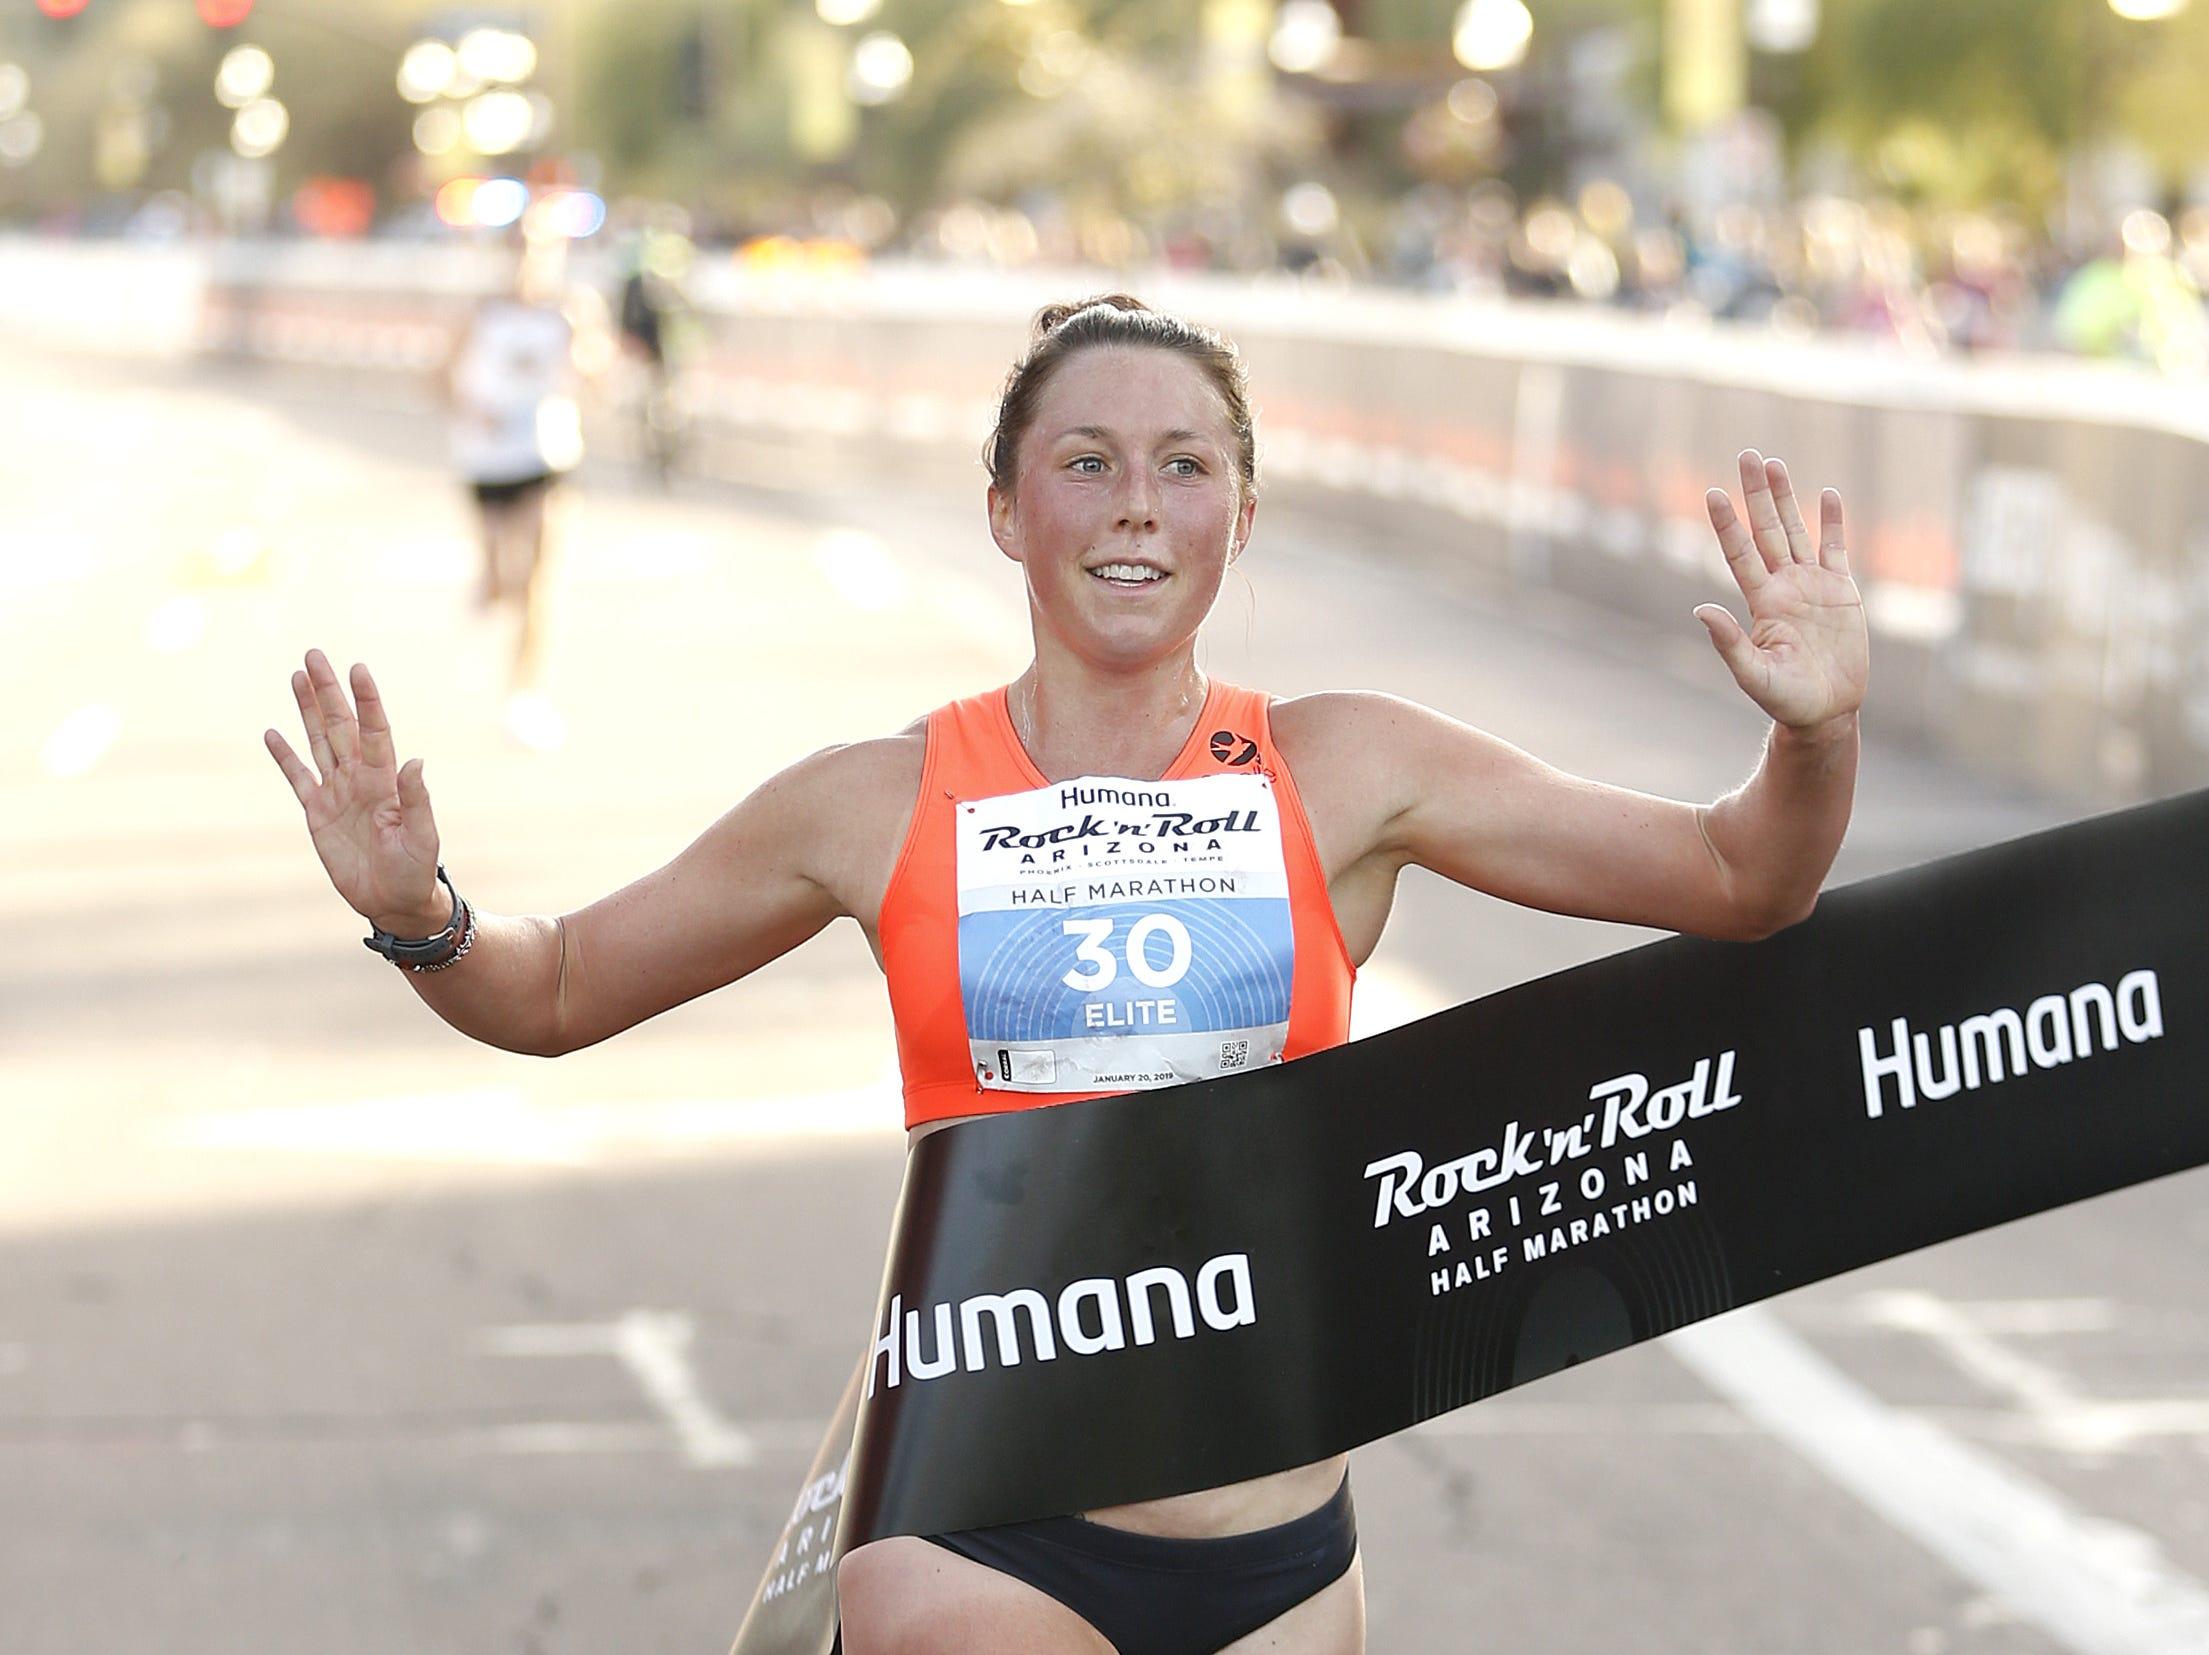 Allie Kieffer celebrates after winning the Rock 'n' Roll half-marathon in Tempe on Jan. 20, 2019.